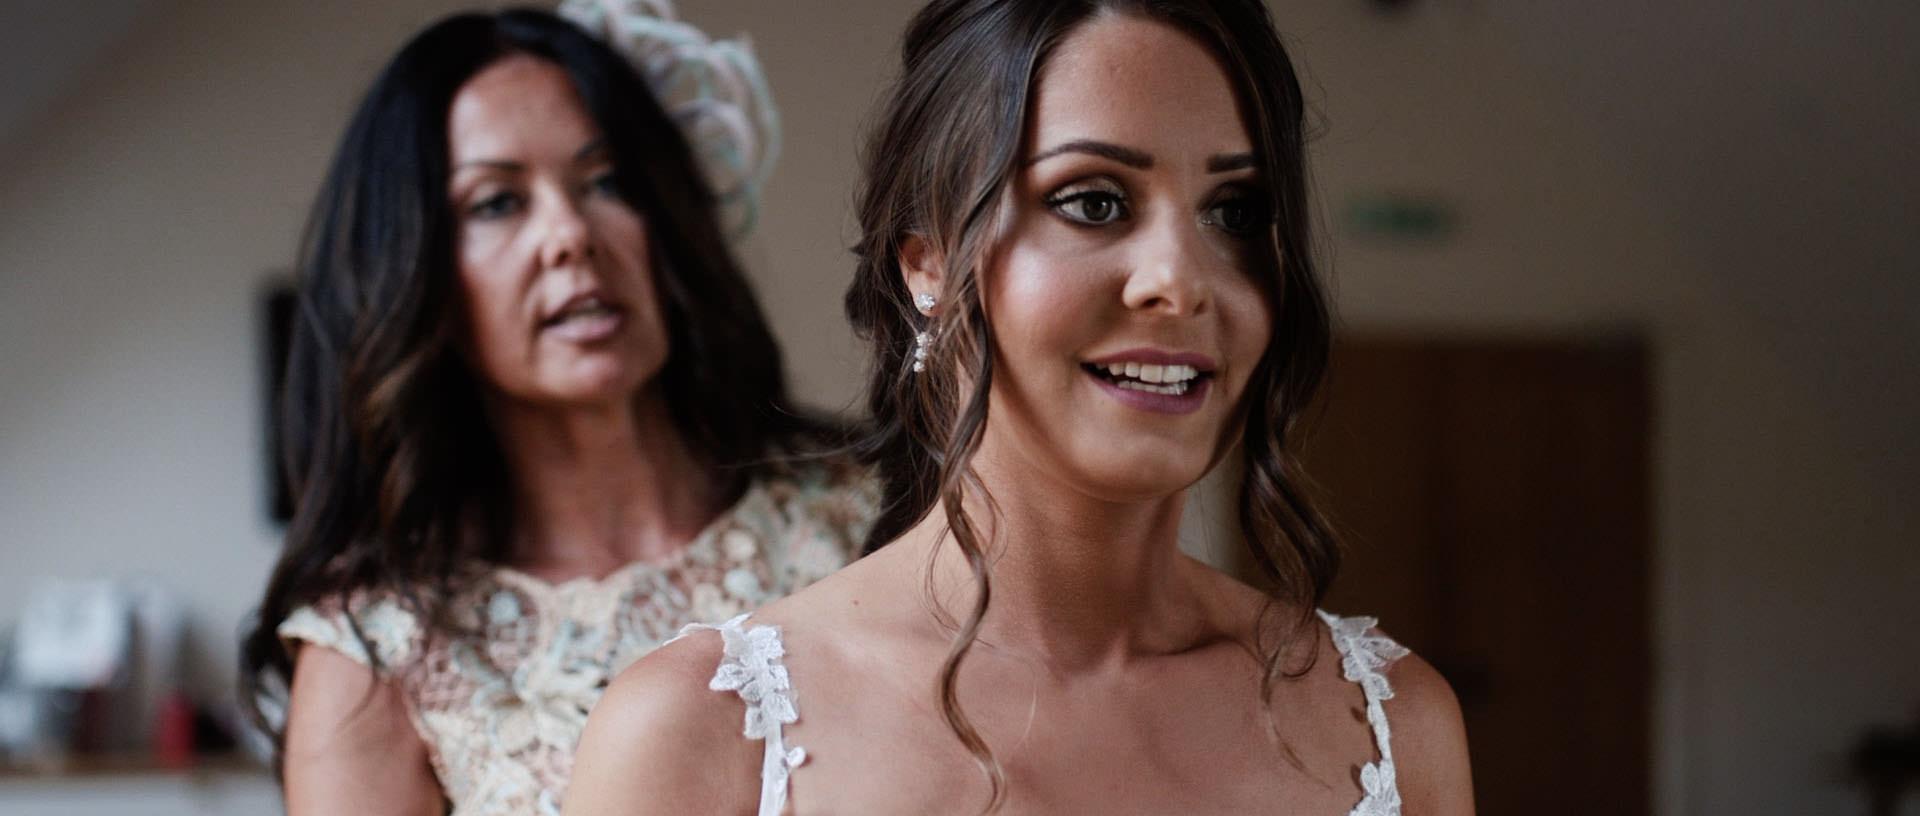 Hyde Barn Colswolds Wedding Verity-Jade & Kai 14 Cropped.jpg